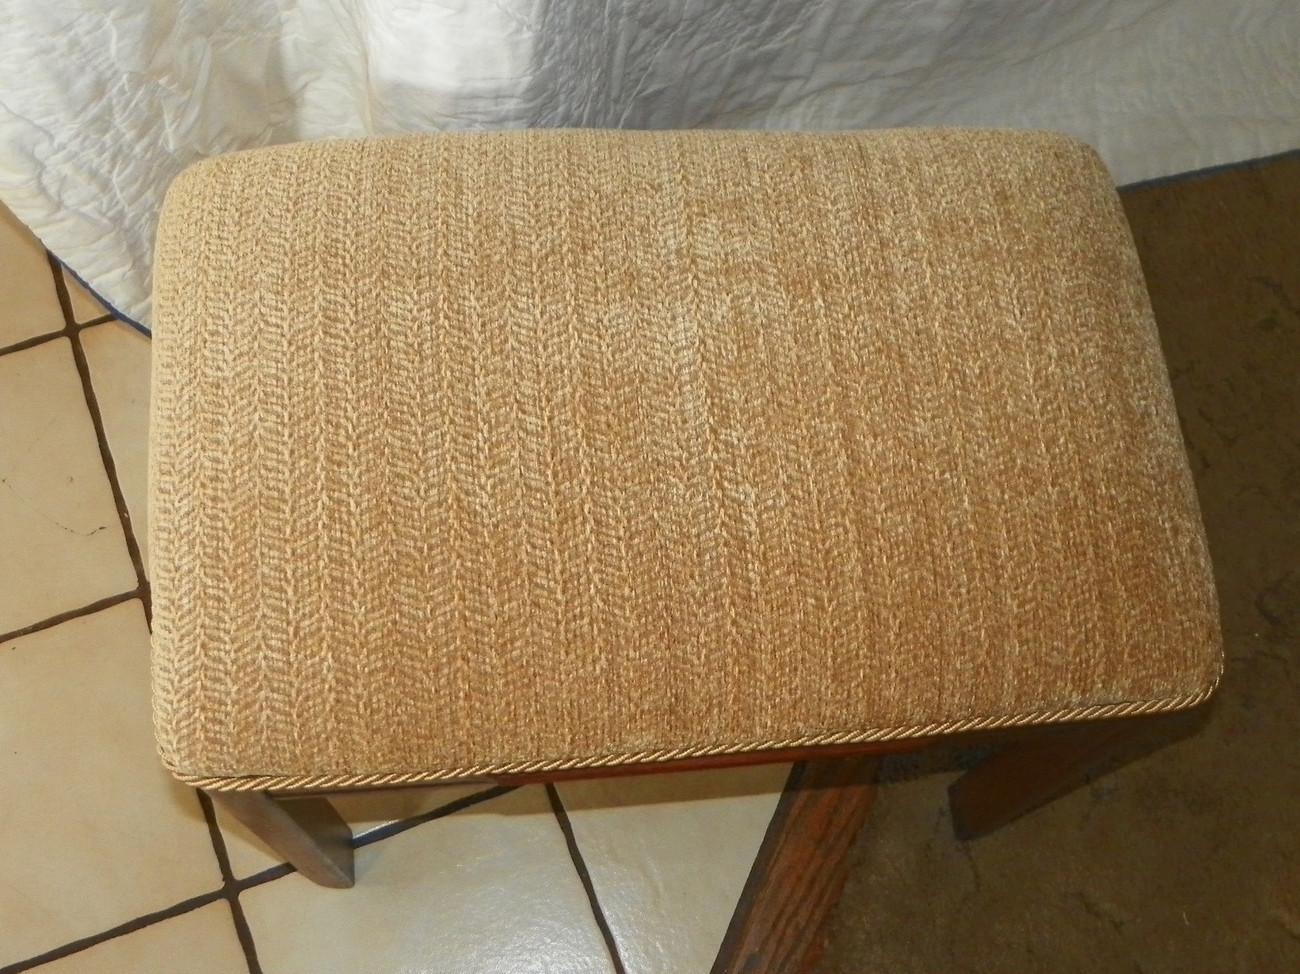 Mahogany Vanity Bench / Hall Bench / Gold Herringbone Print Chenille